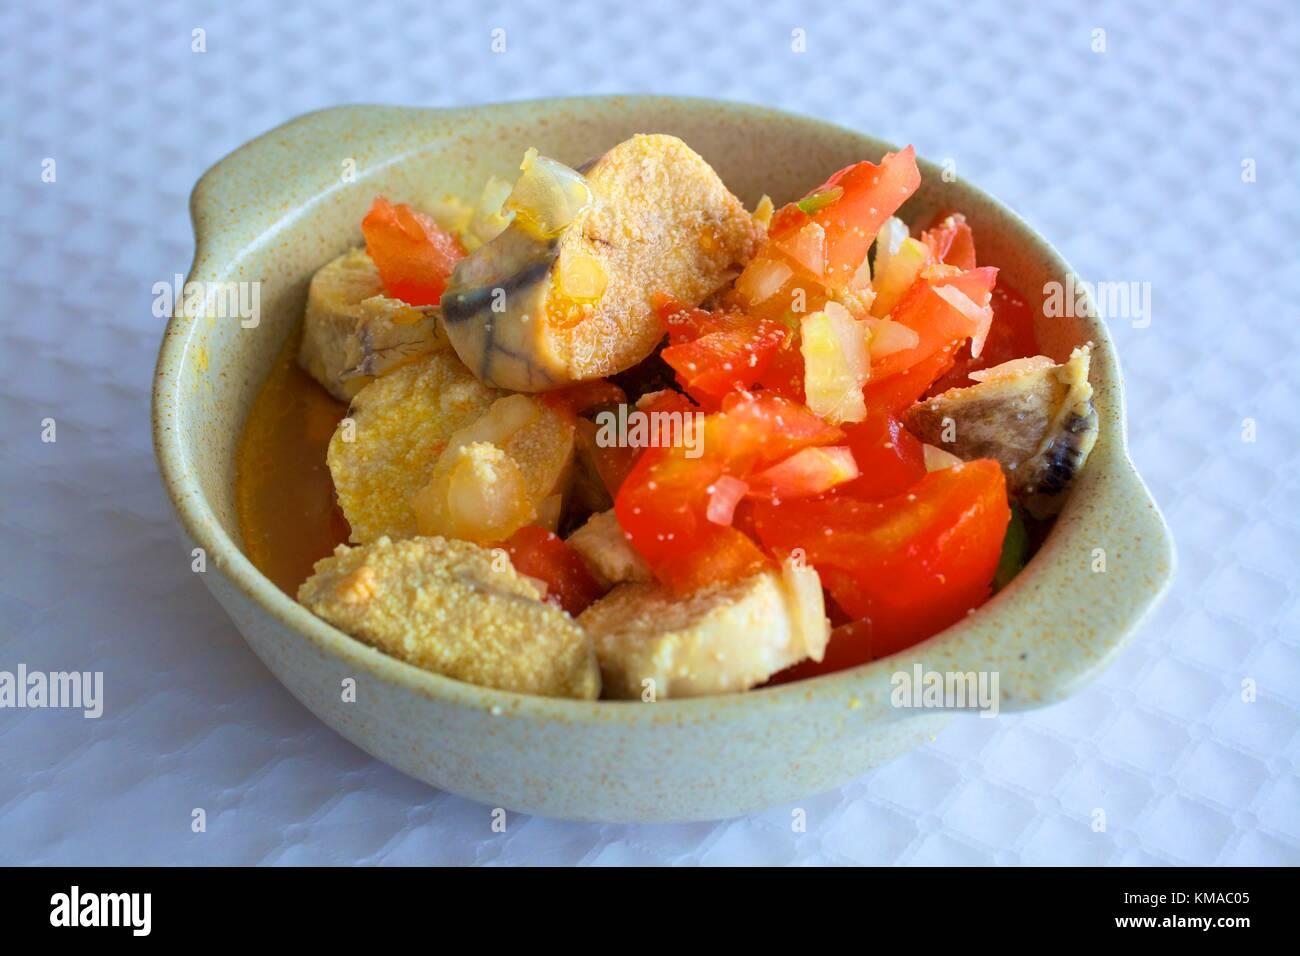 Fish Roe Appetiser, Eastern Algarve, Algarve, Portugal, Europe - Stock Image